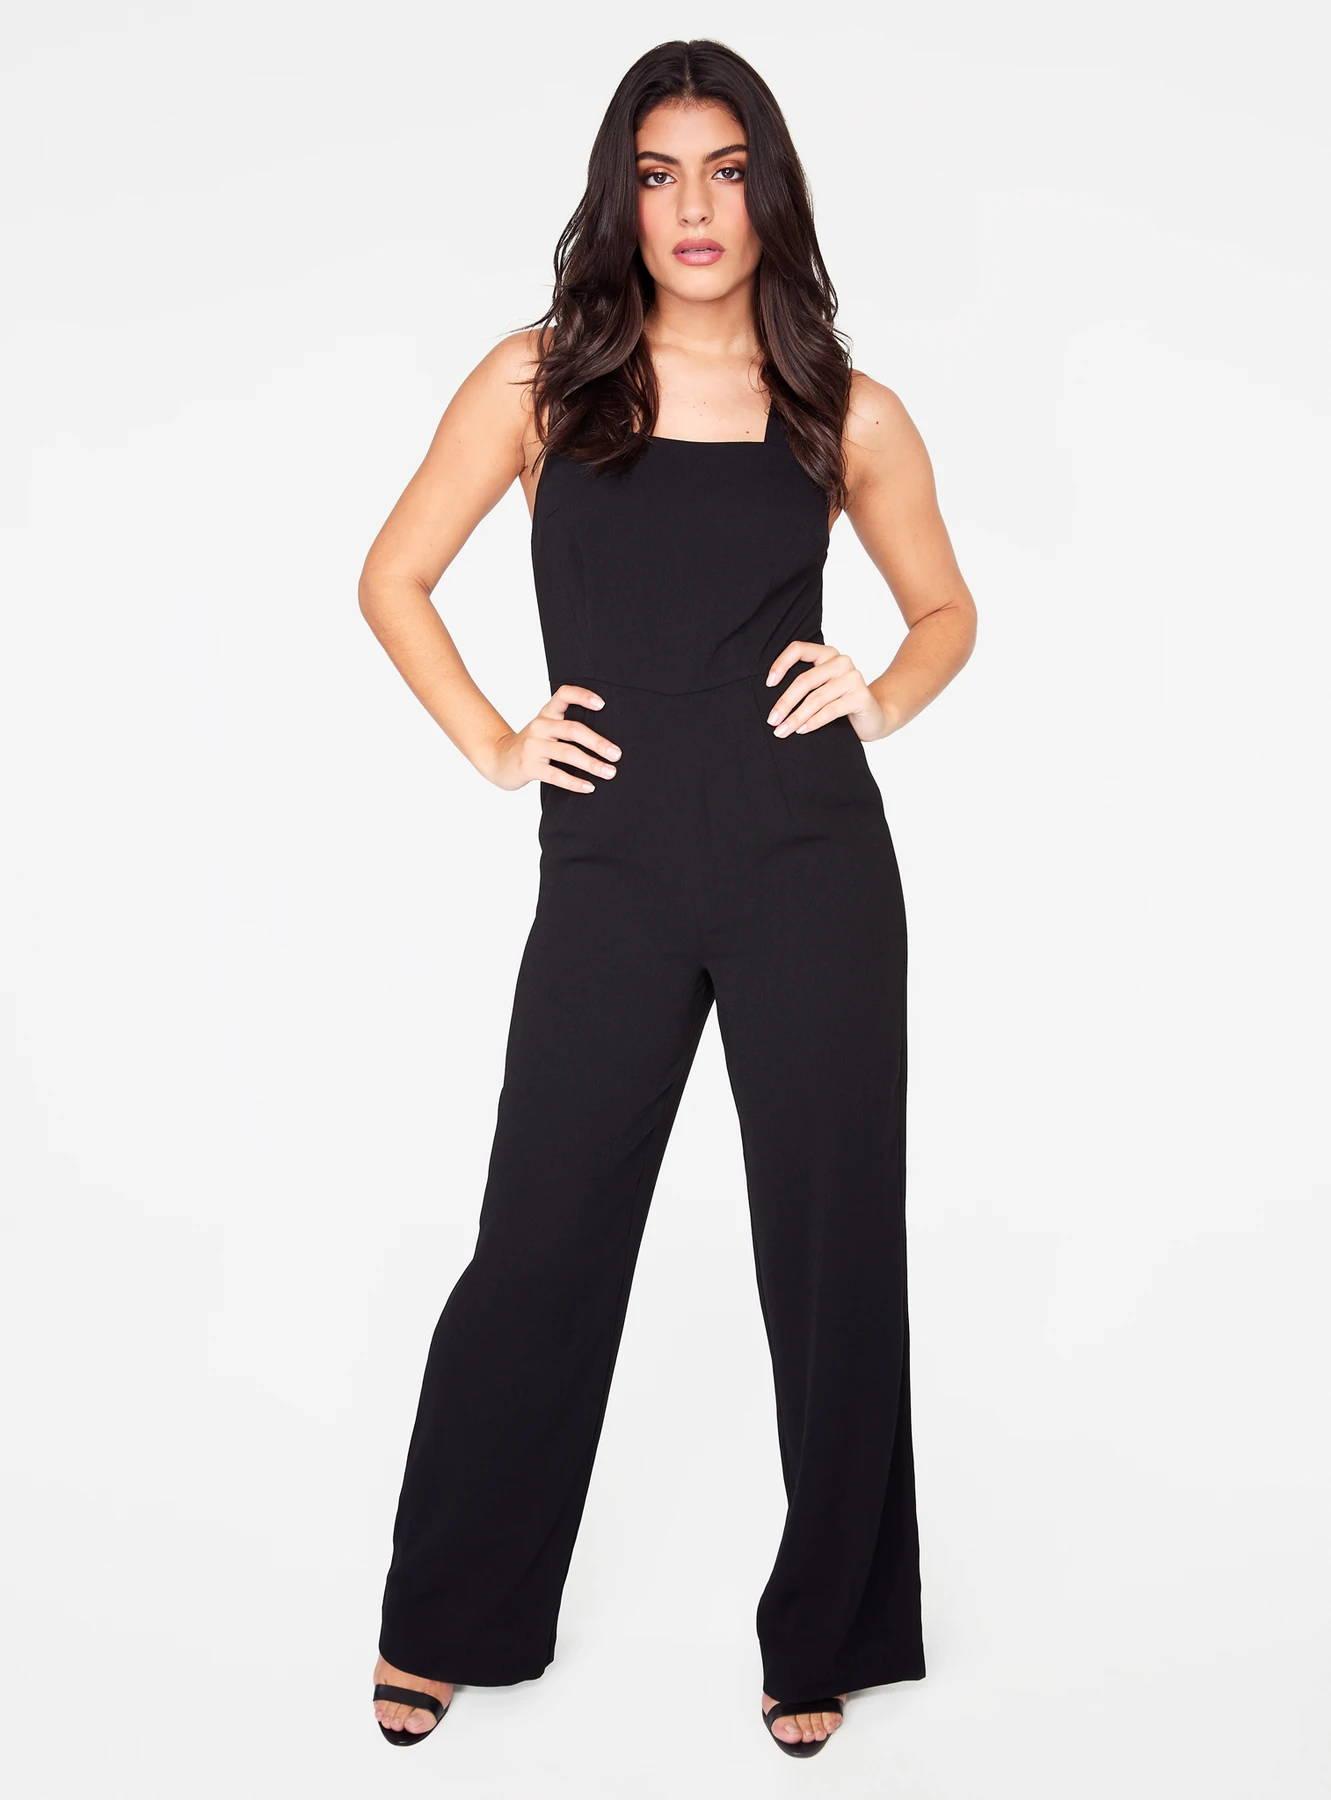 Straight Neck Jumpsuit in Black